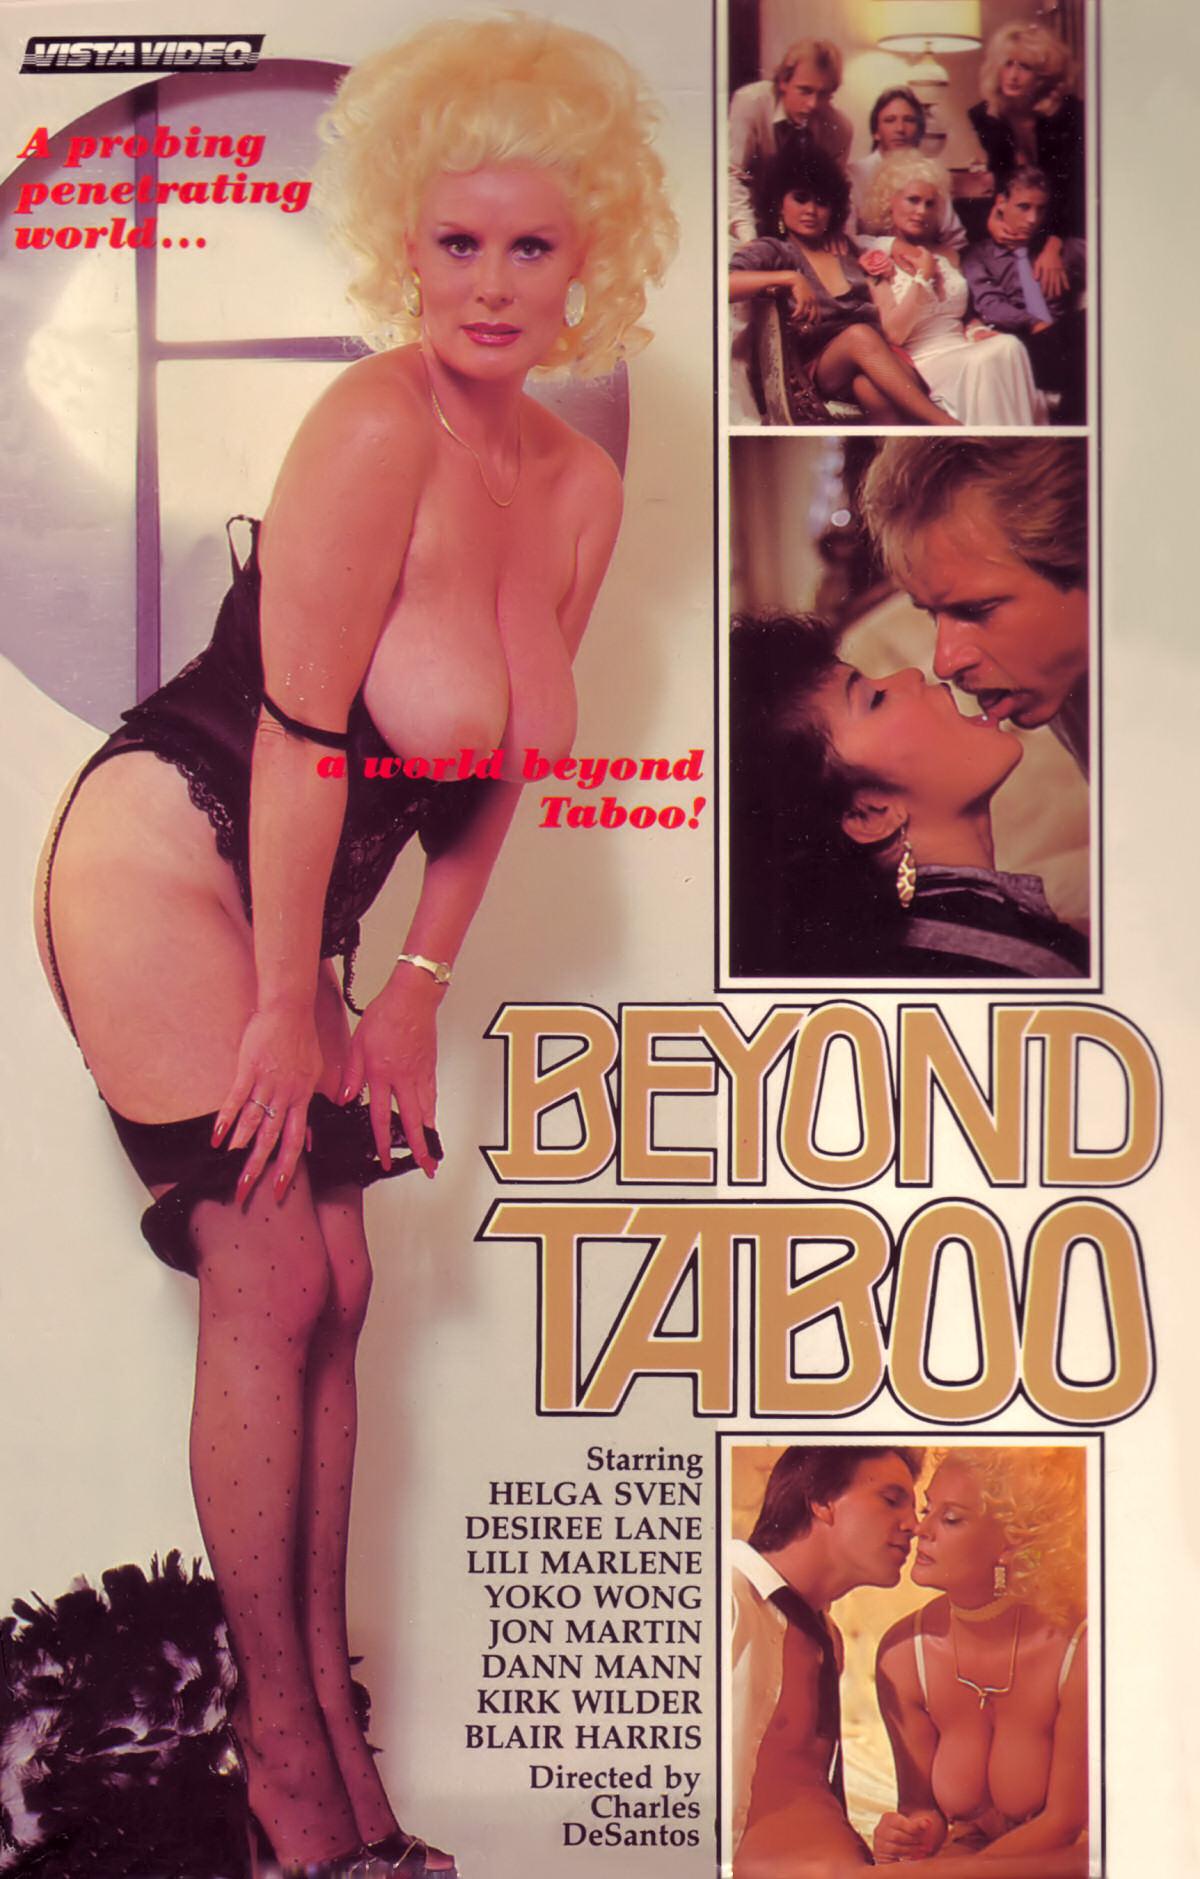 Смотреть онлайн порно taboo japanese style 5 фотография